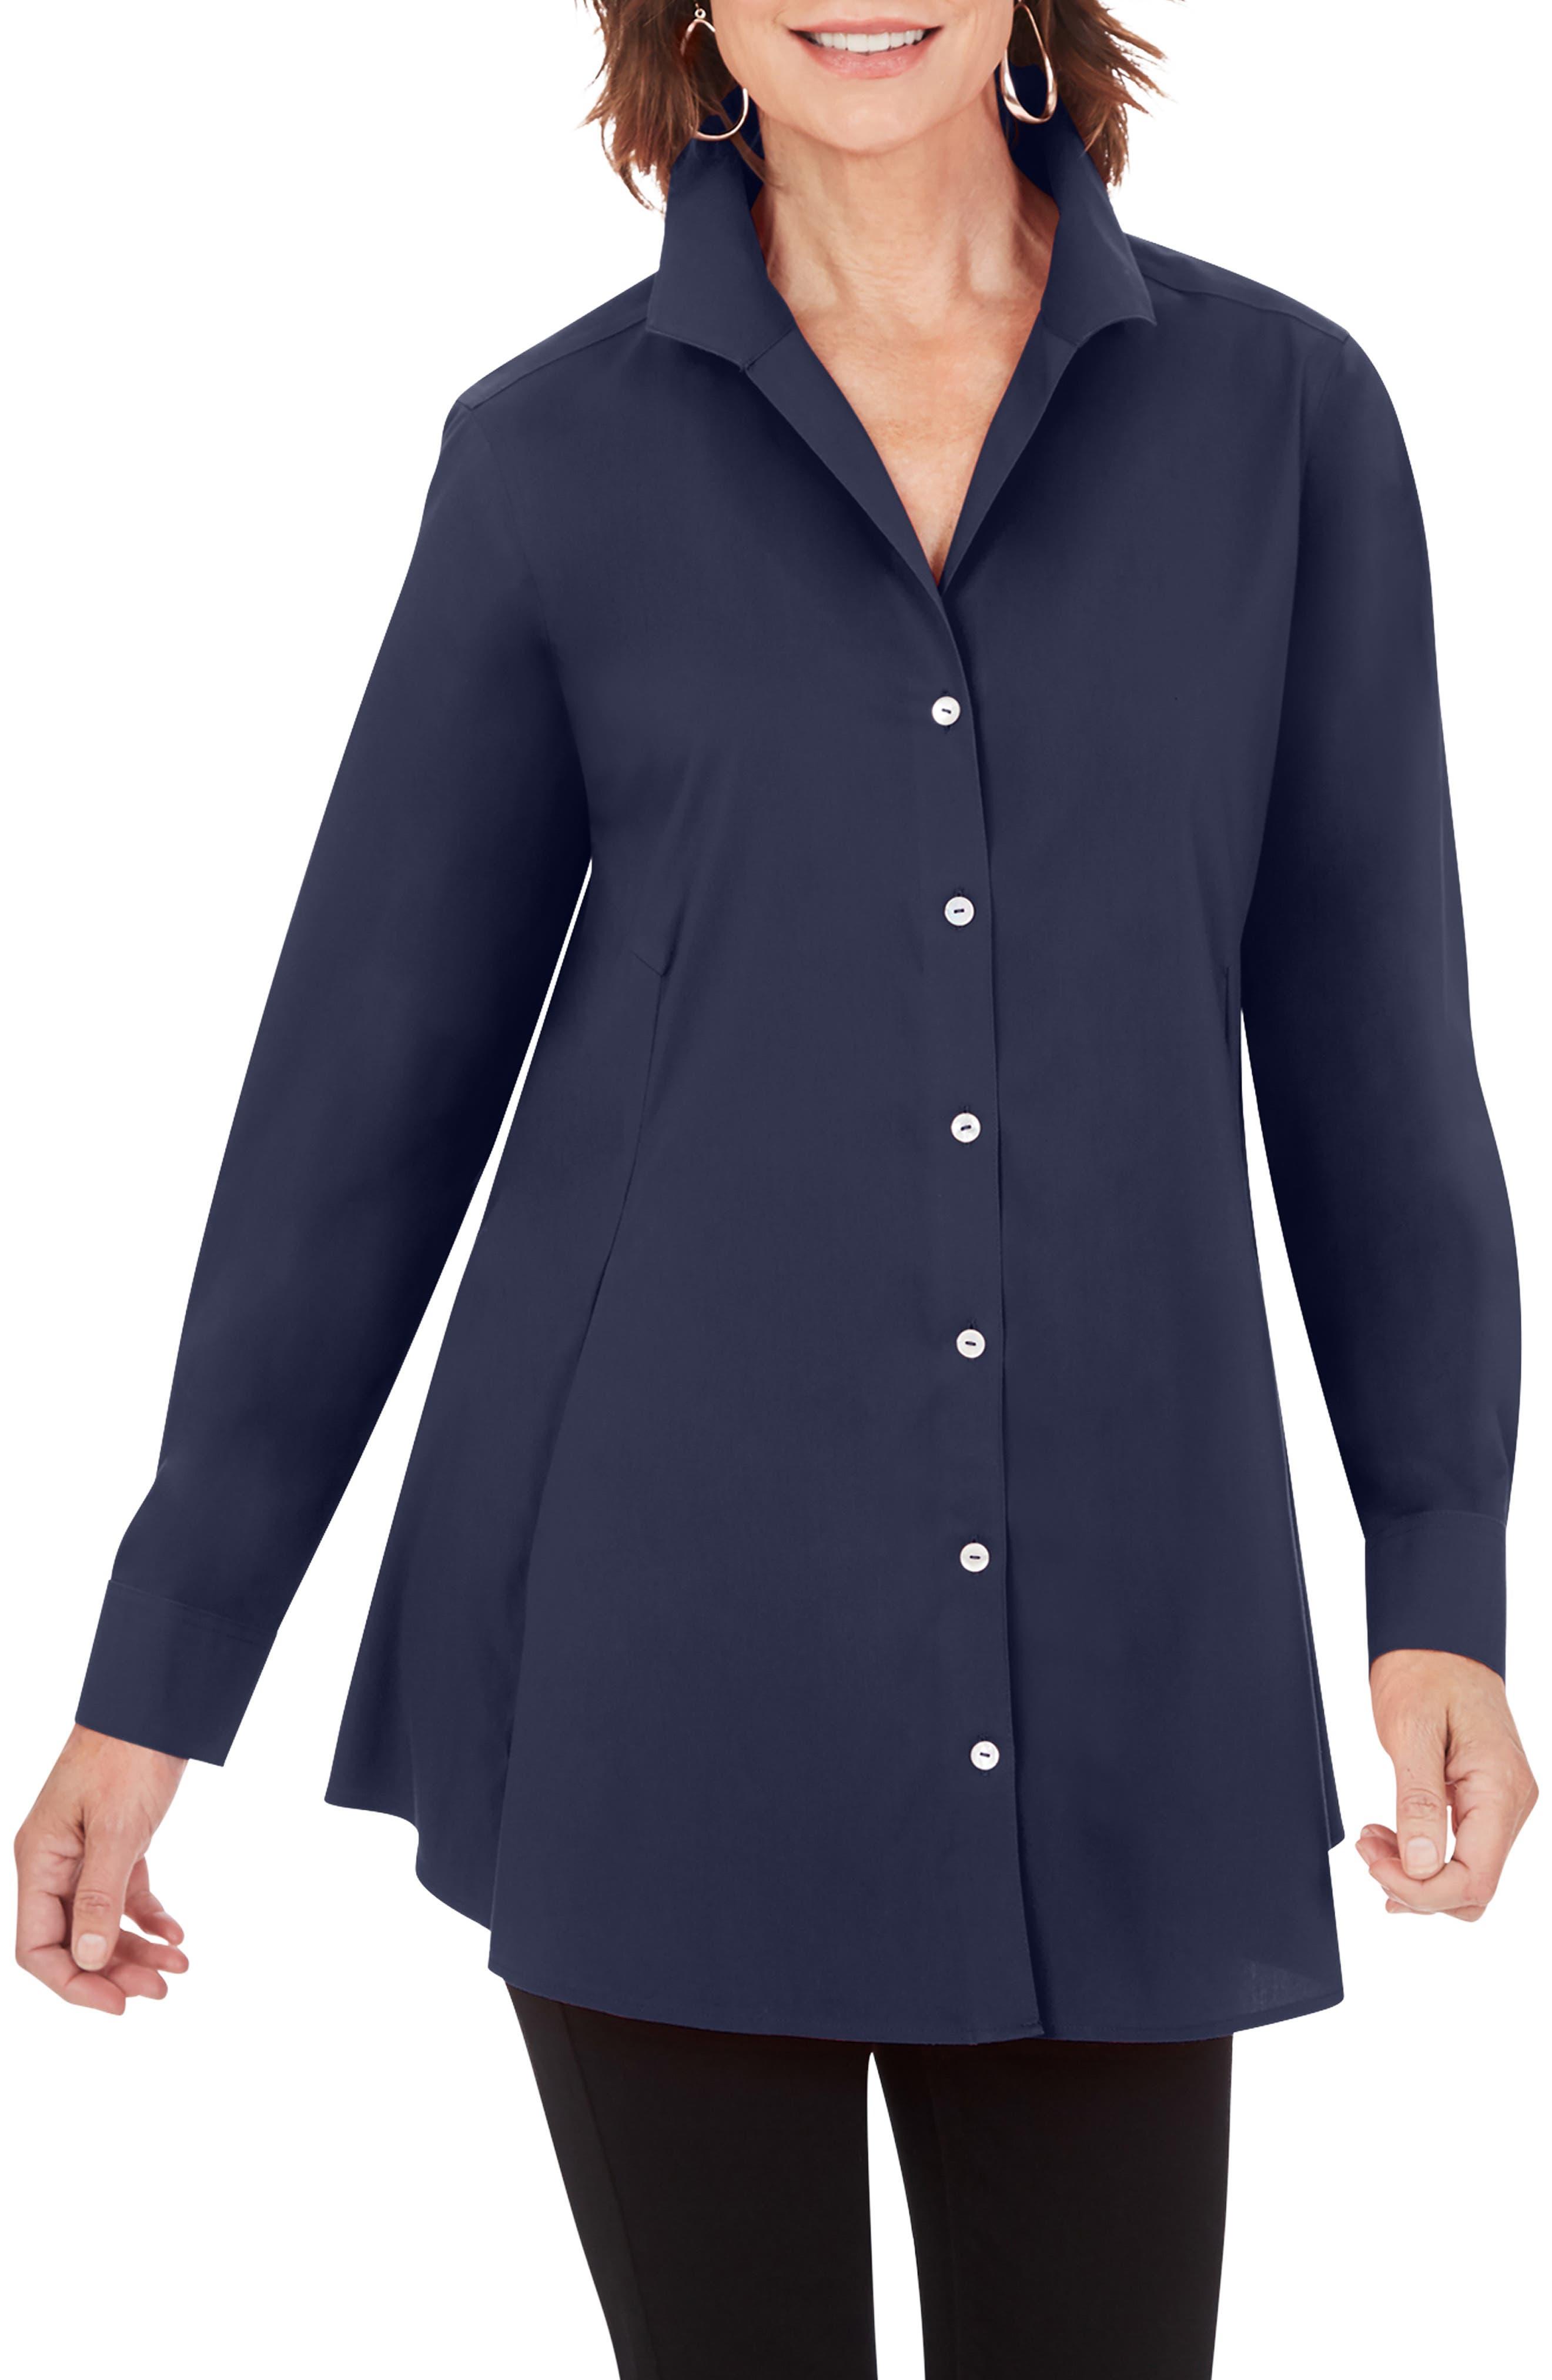 Cecilia Non-Iron Button-Up Tunic Shirt